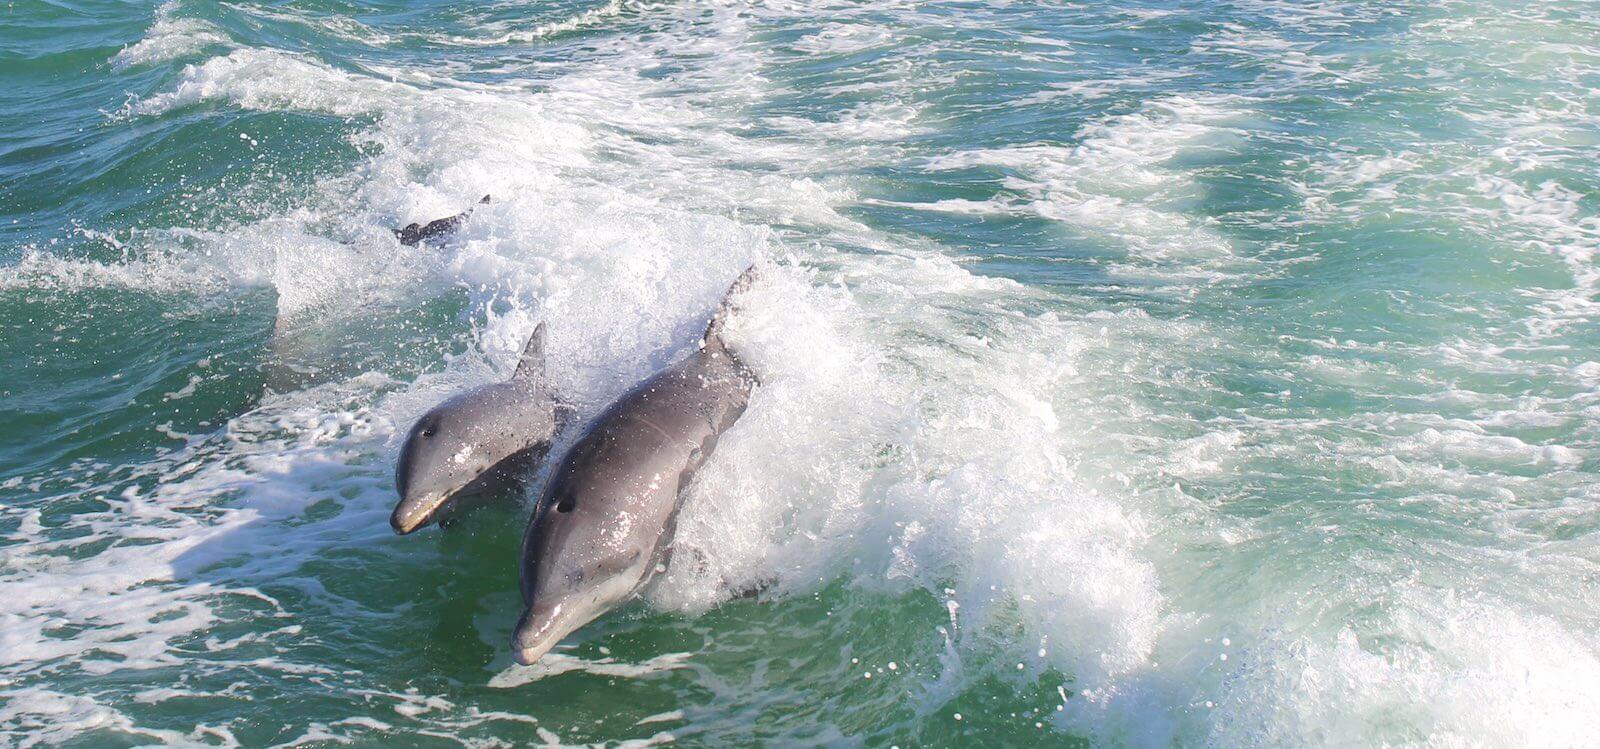 Sarasota Sunset Cruise, Boat Tours & Airboat Rides | Must Do